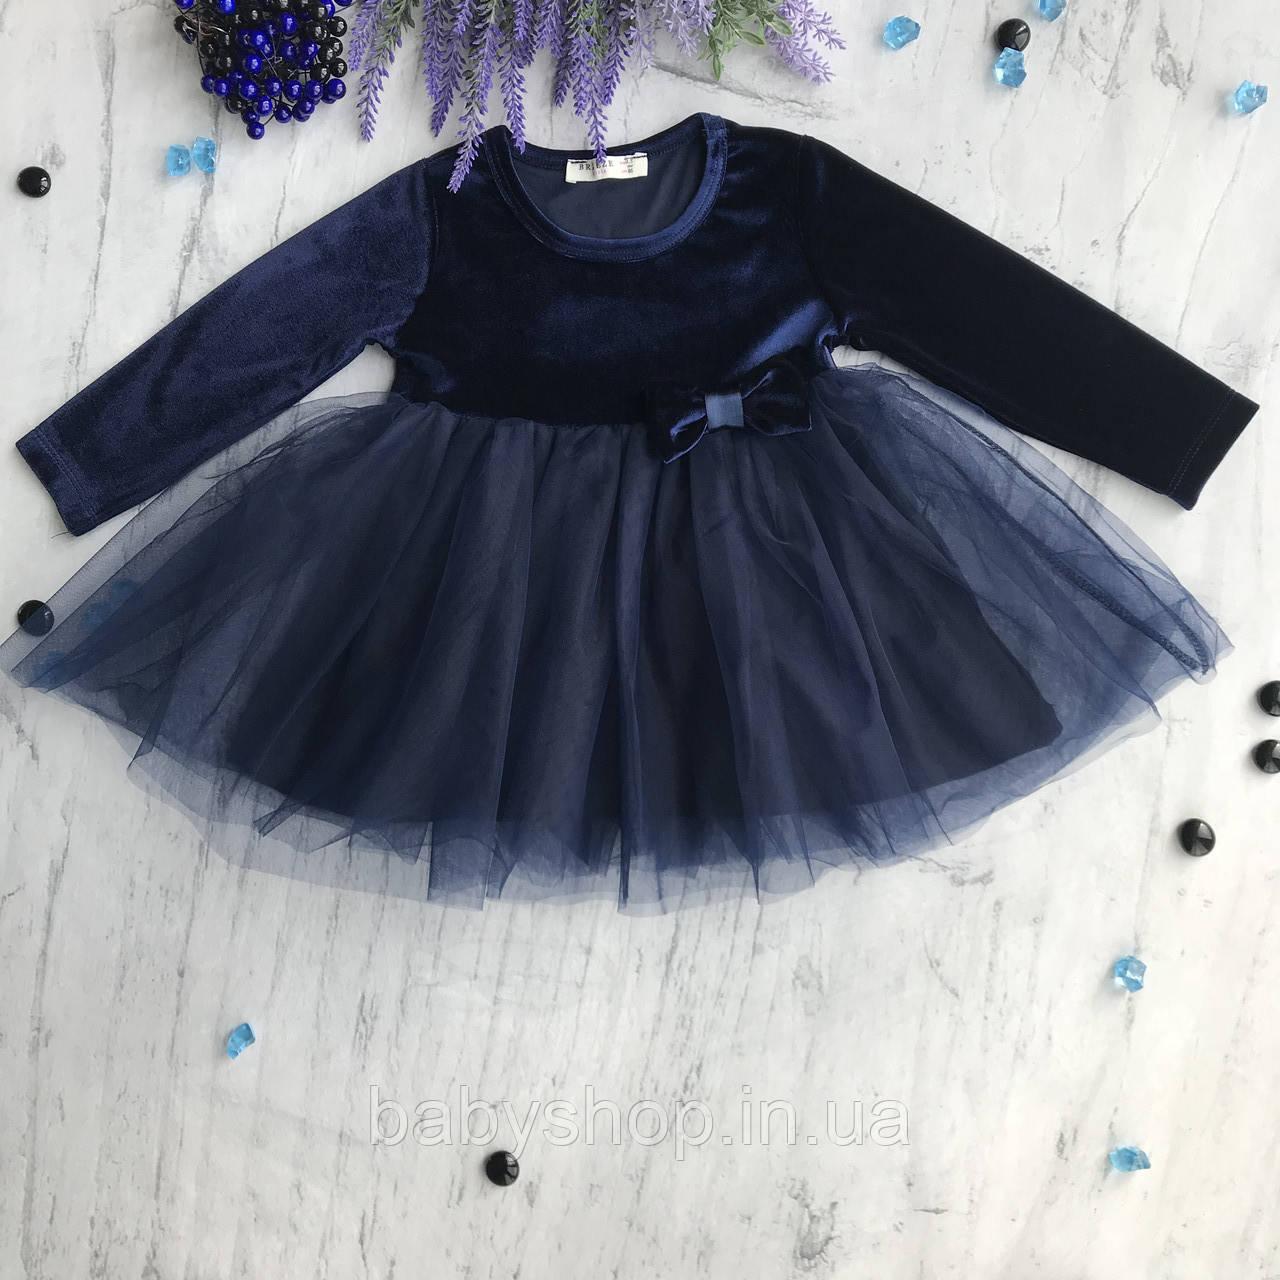 Платье Breeze 30. Размер 86,92,122 см